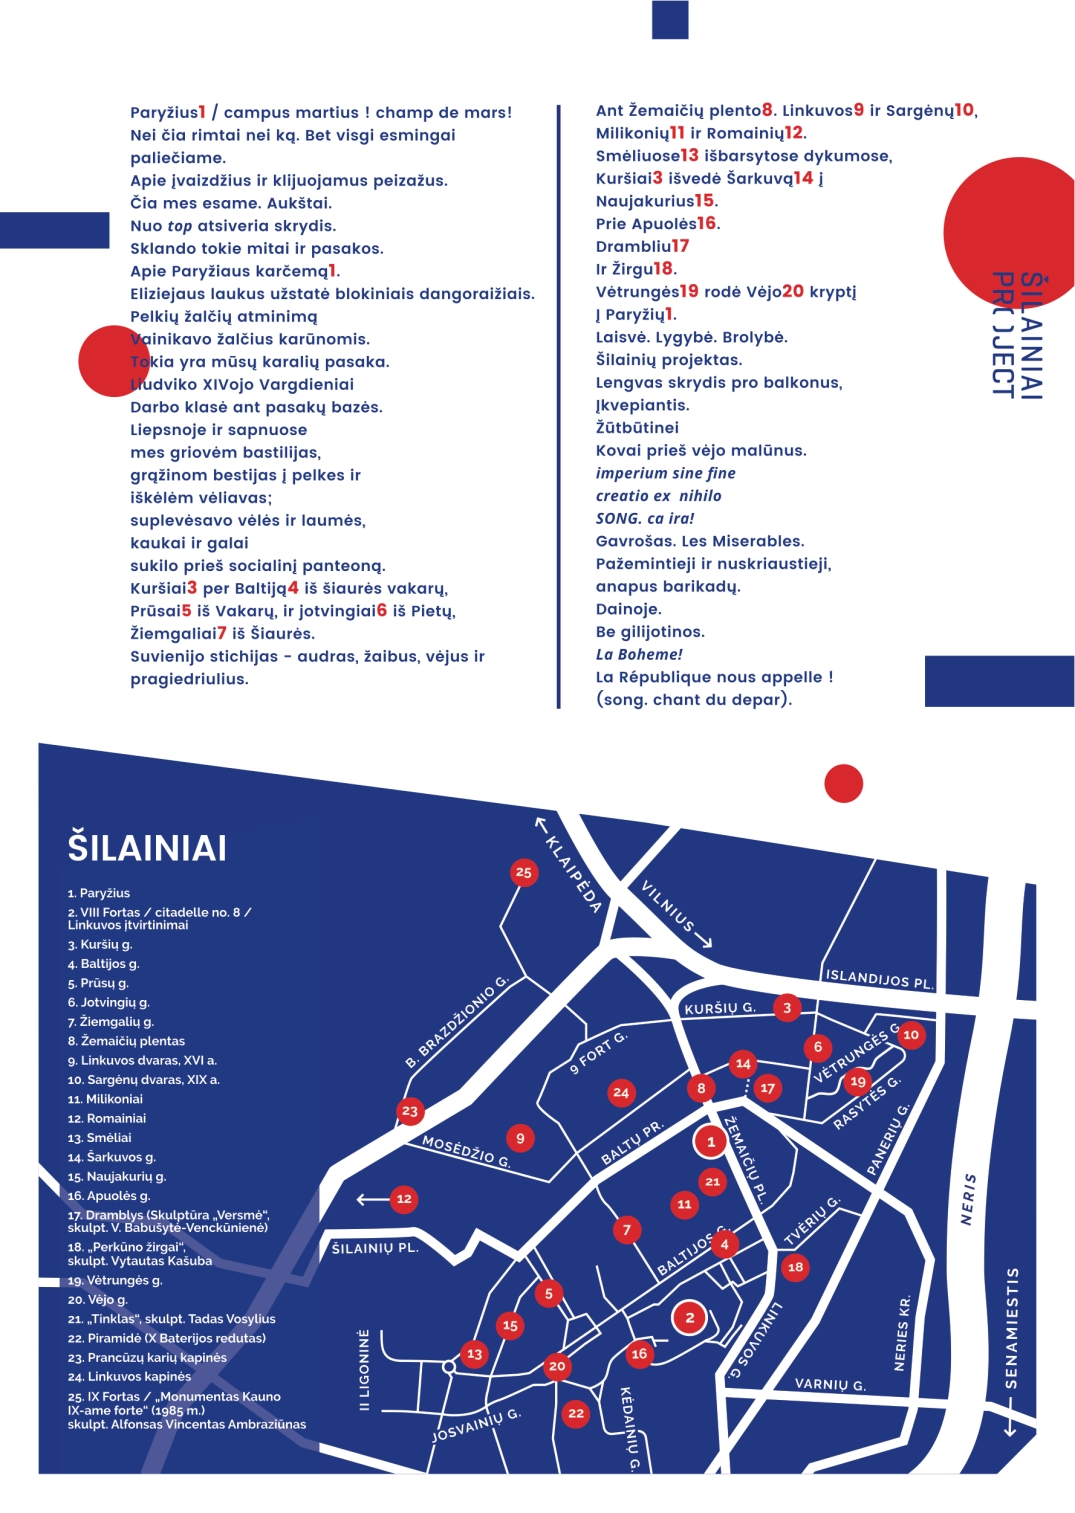 Silainiai_Project_Map